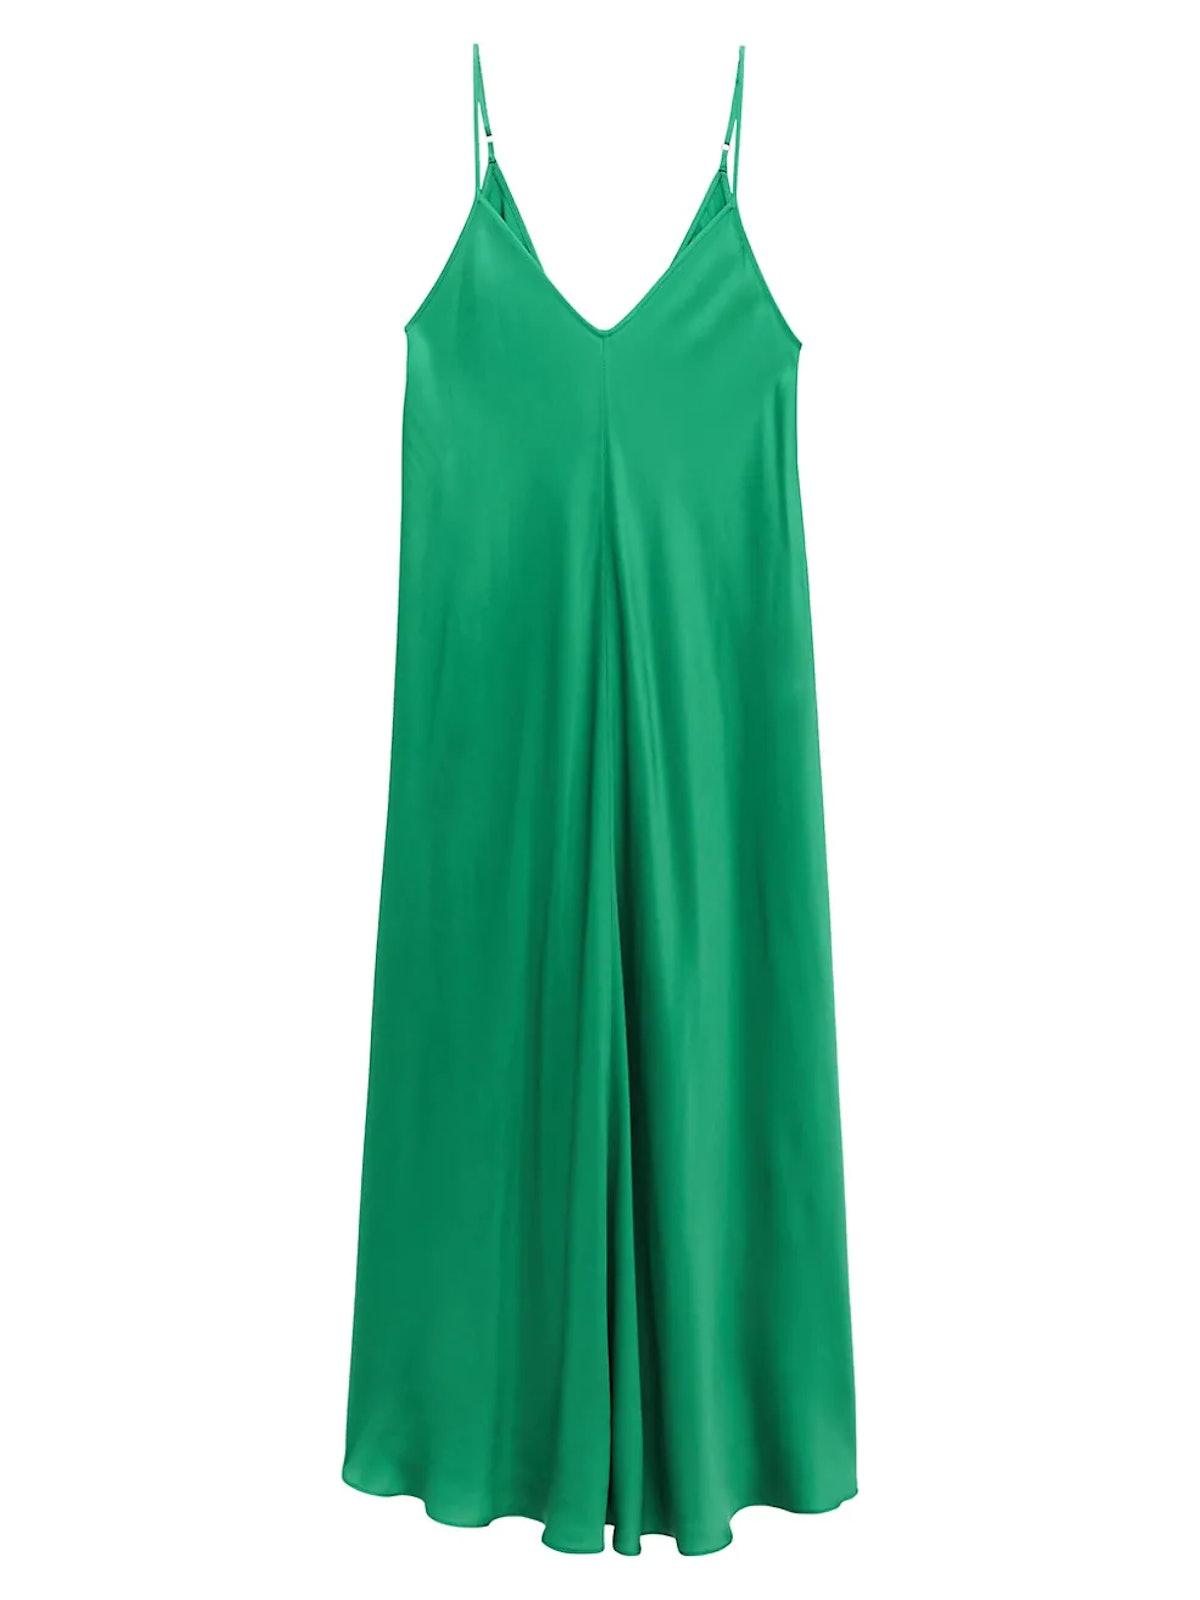 L'AGENCE Lorraine slip midi dress in amazon green.